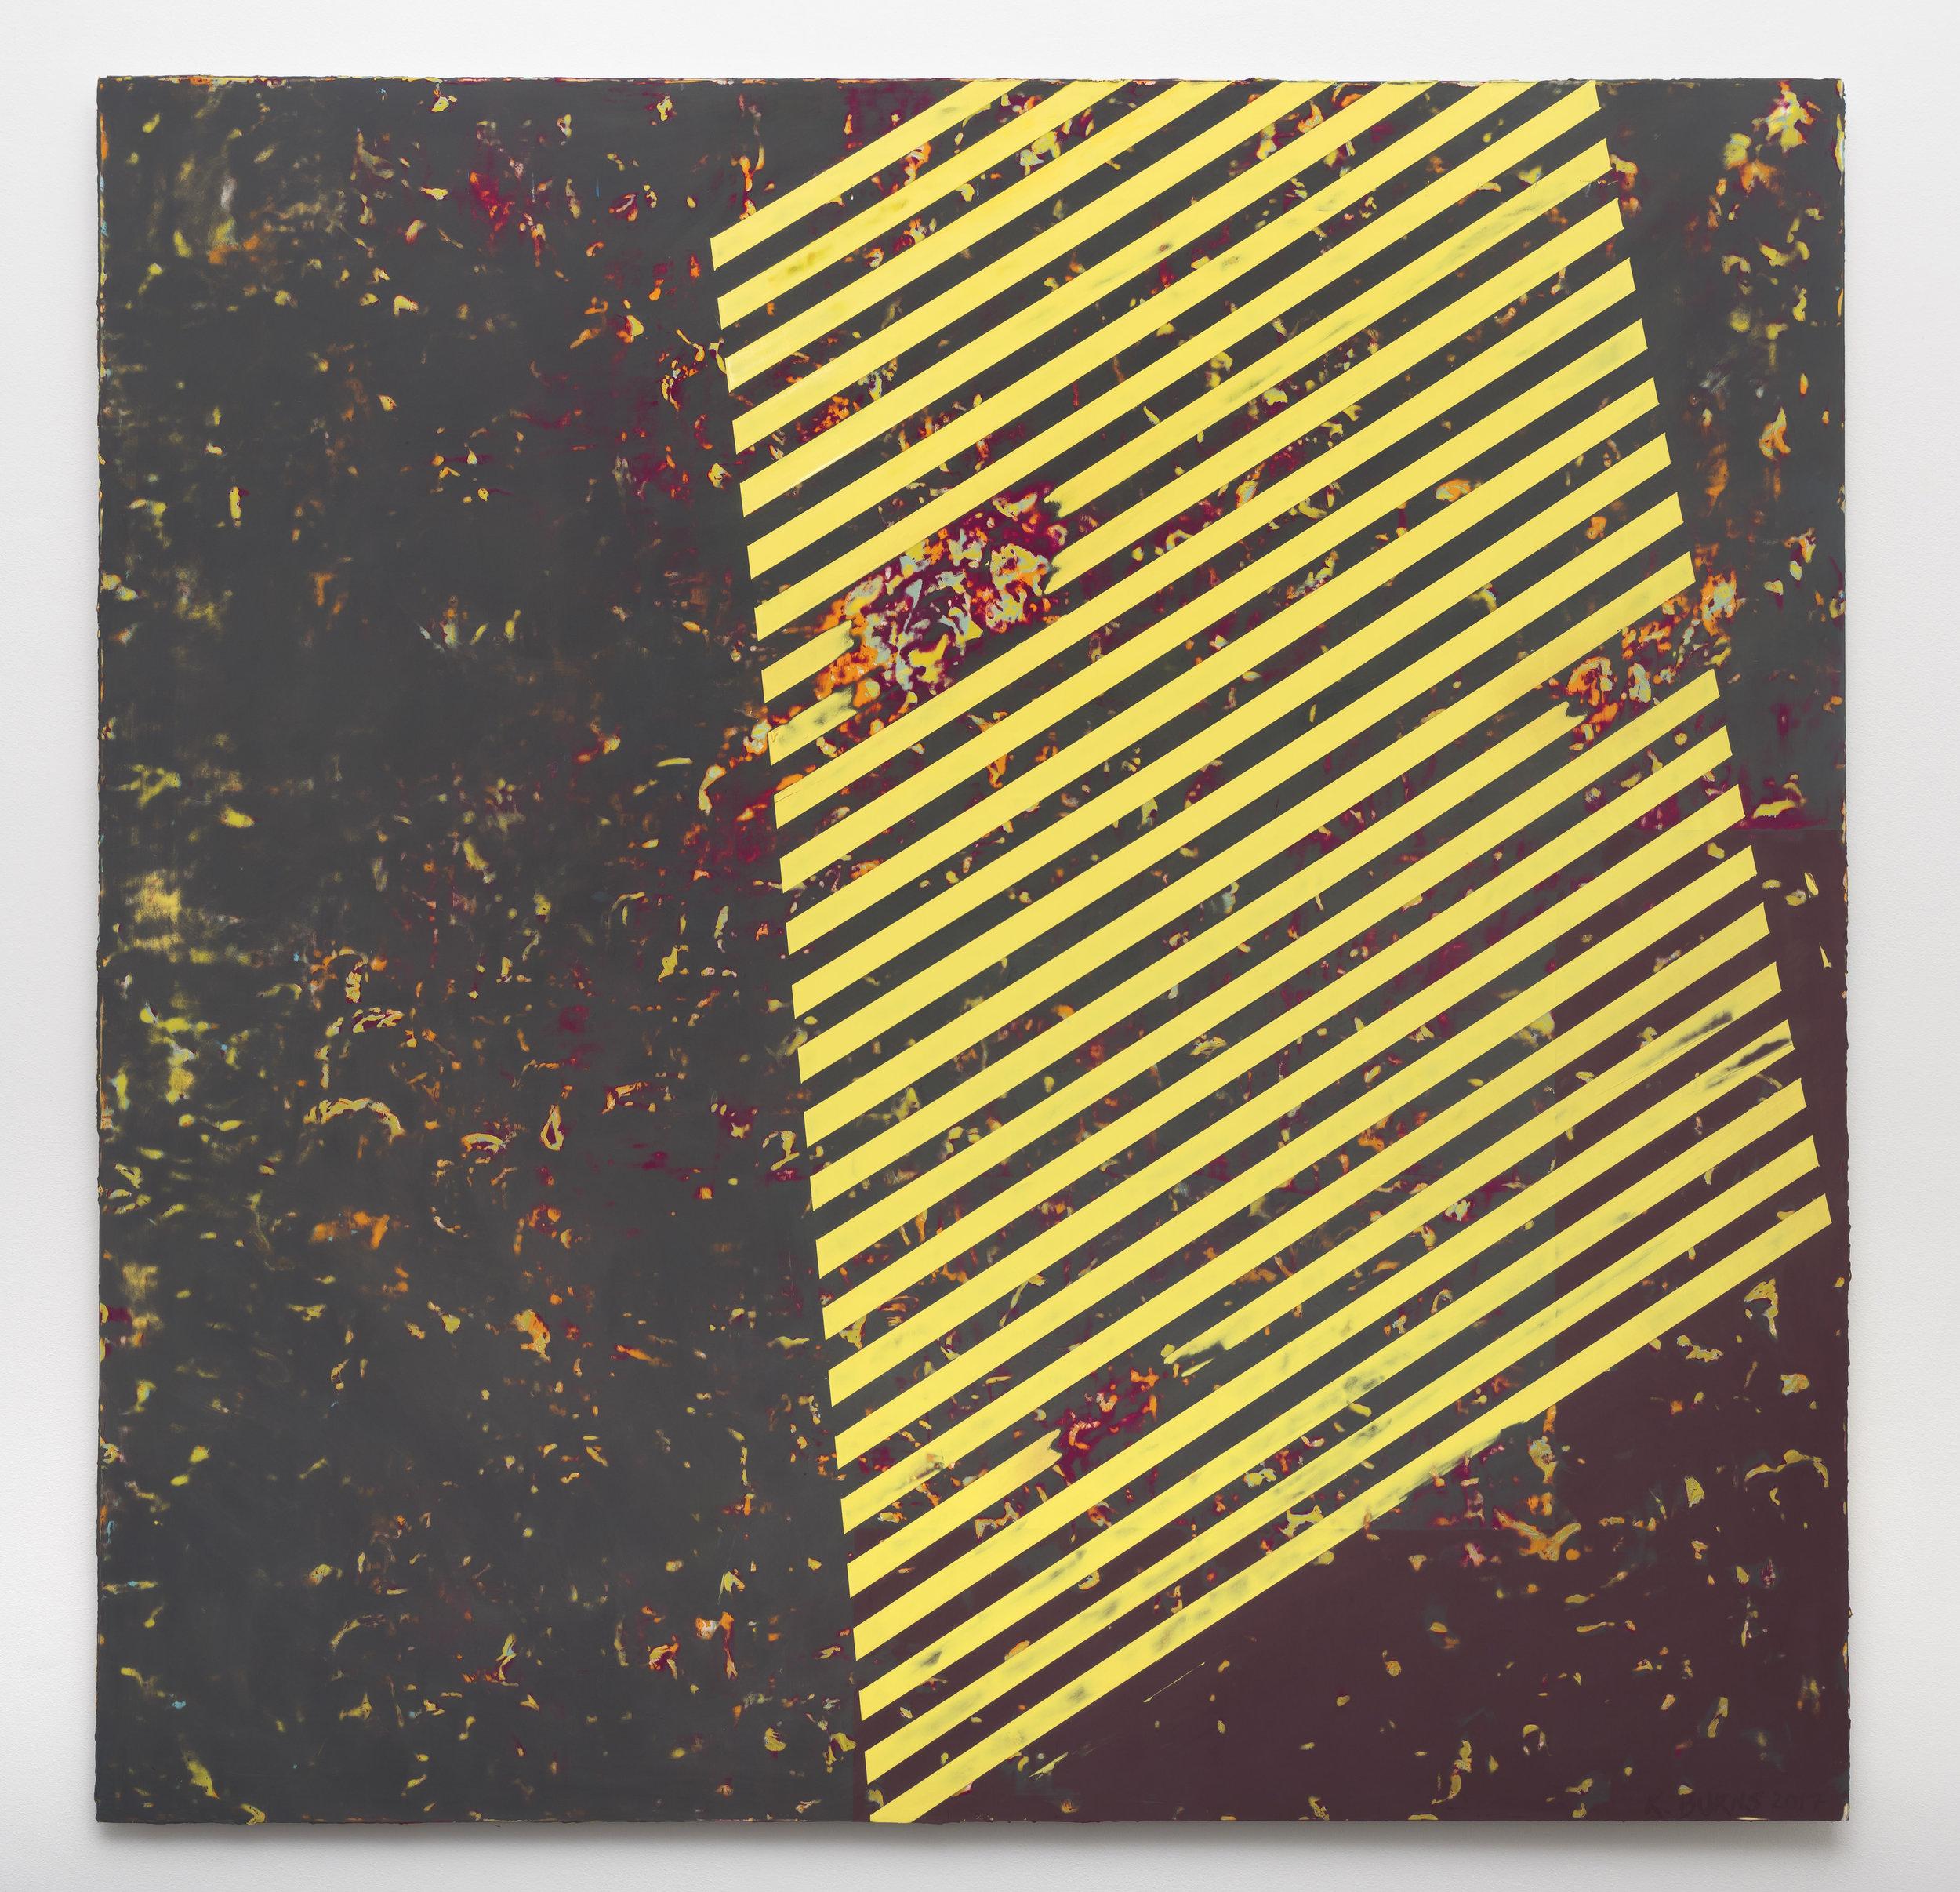 8:01 PM 6/11/17 , 2017 oil on Alu-DiBond 60 x 60 inches; 152.4 x 152.4 centimeters